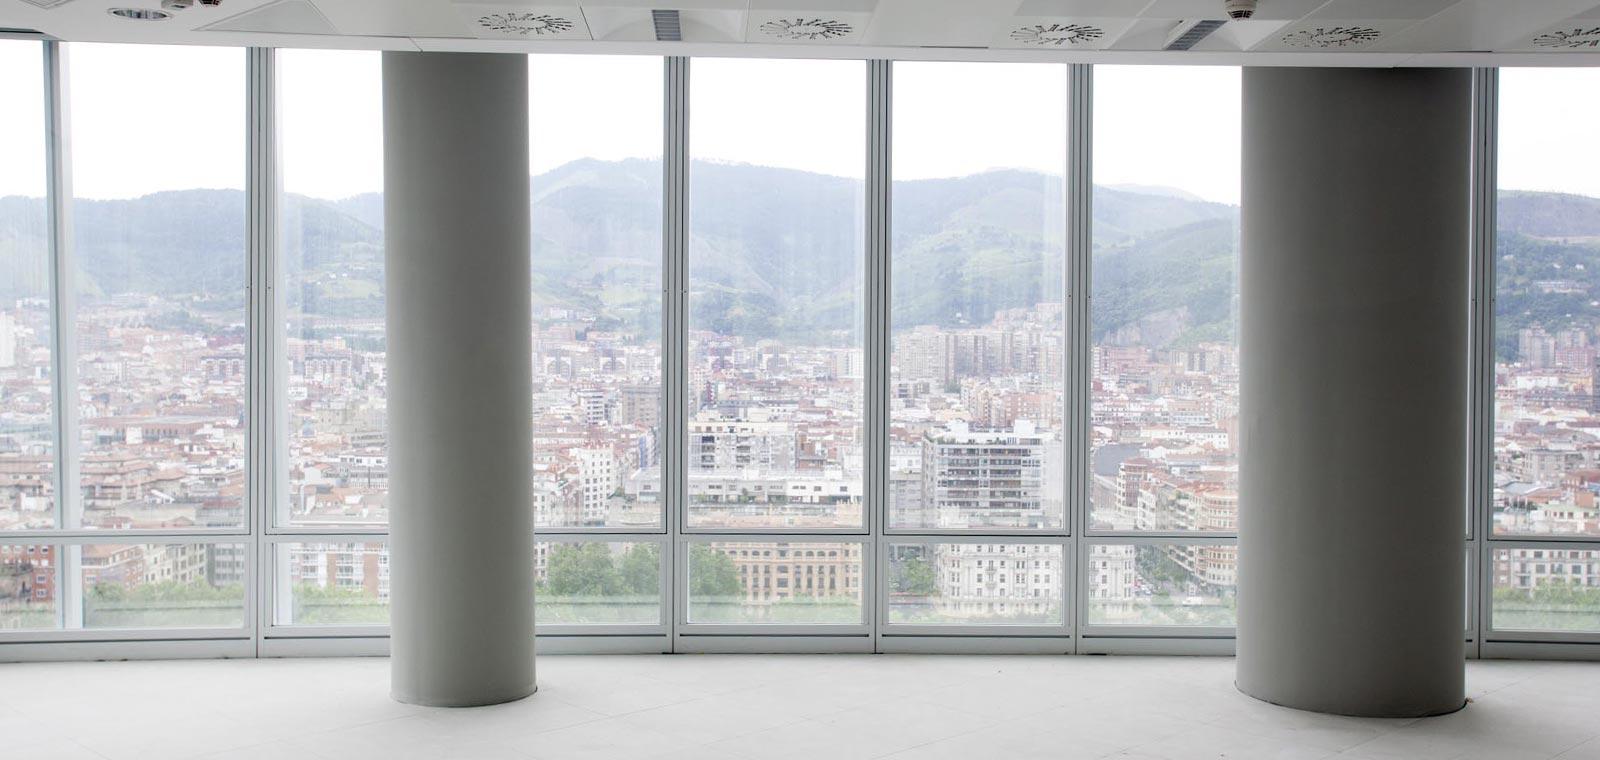 Torre iberdrola bilbao for Oficina iberdrola